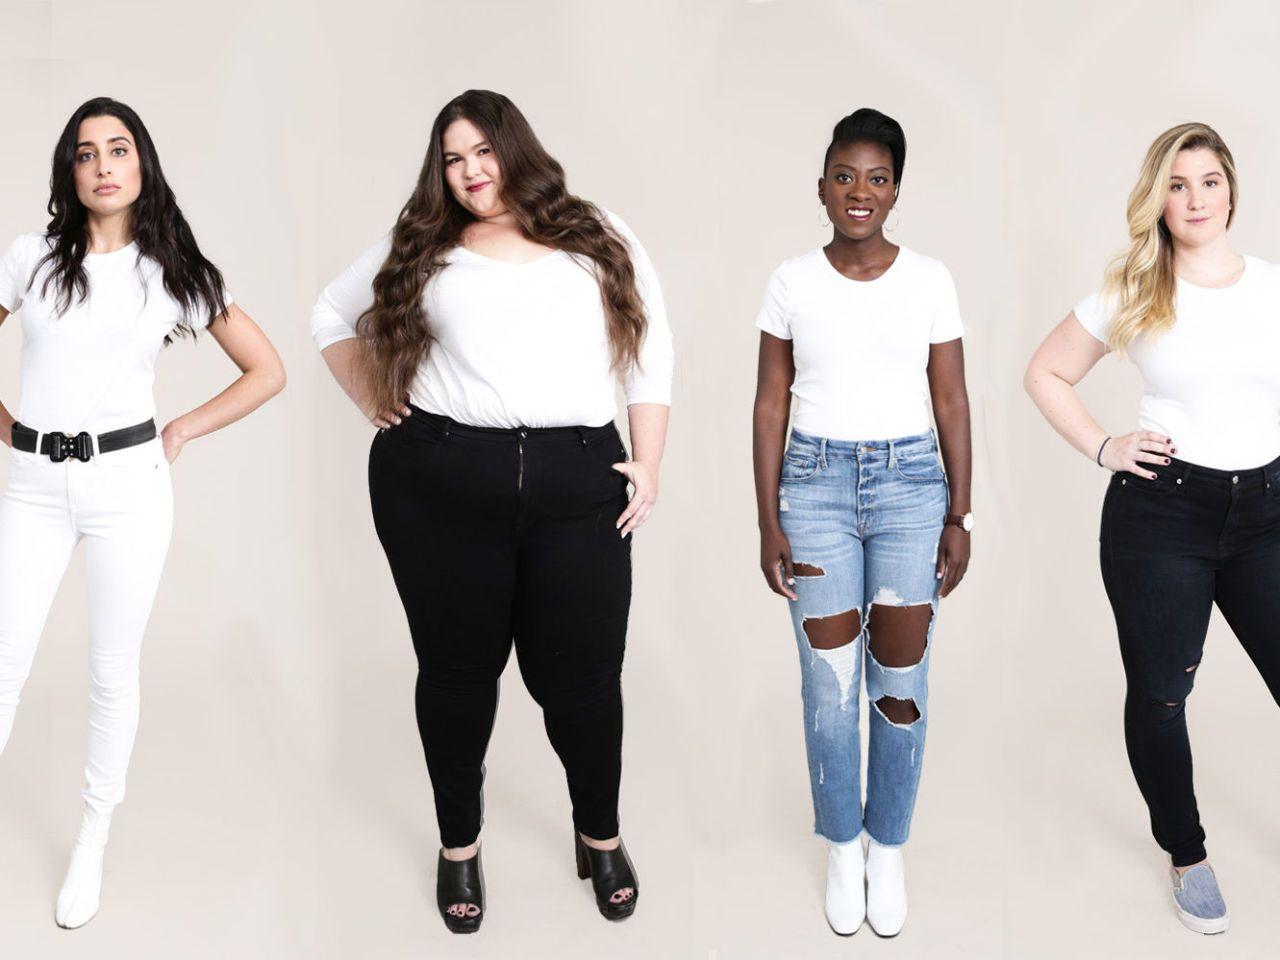 Women/'s Super High Waist Super Stretch Skinny Jeans Denim Trousers UKSize 6-20